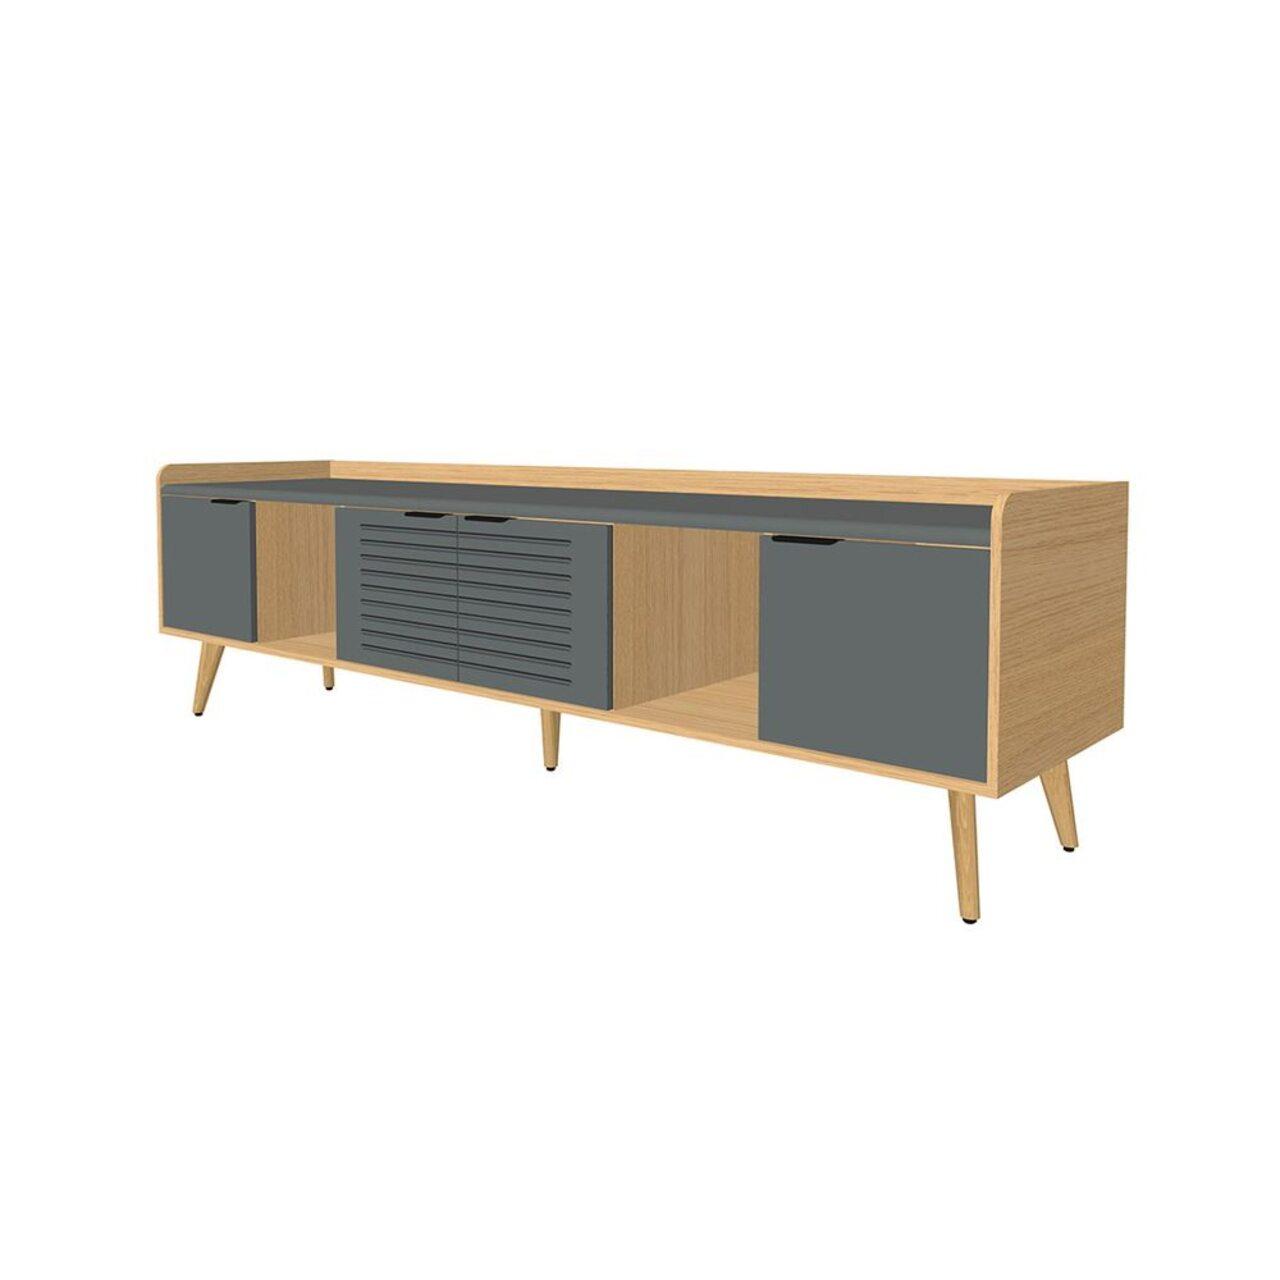 Тумба опорная для конференц-стола (3 отделения)  Remo 55x223x65 - фото 1